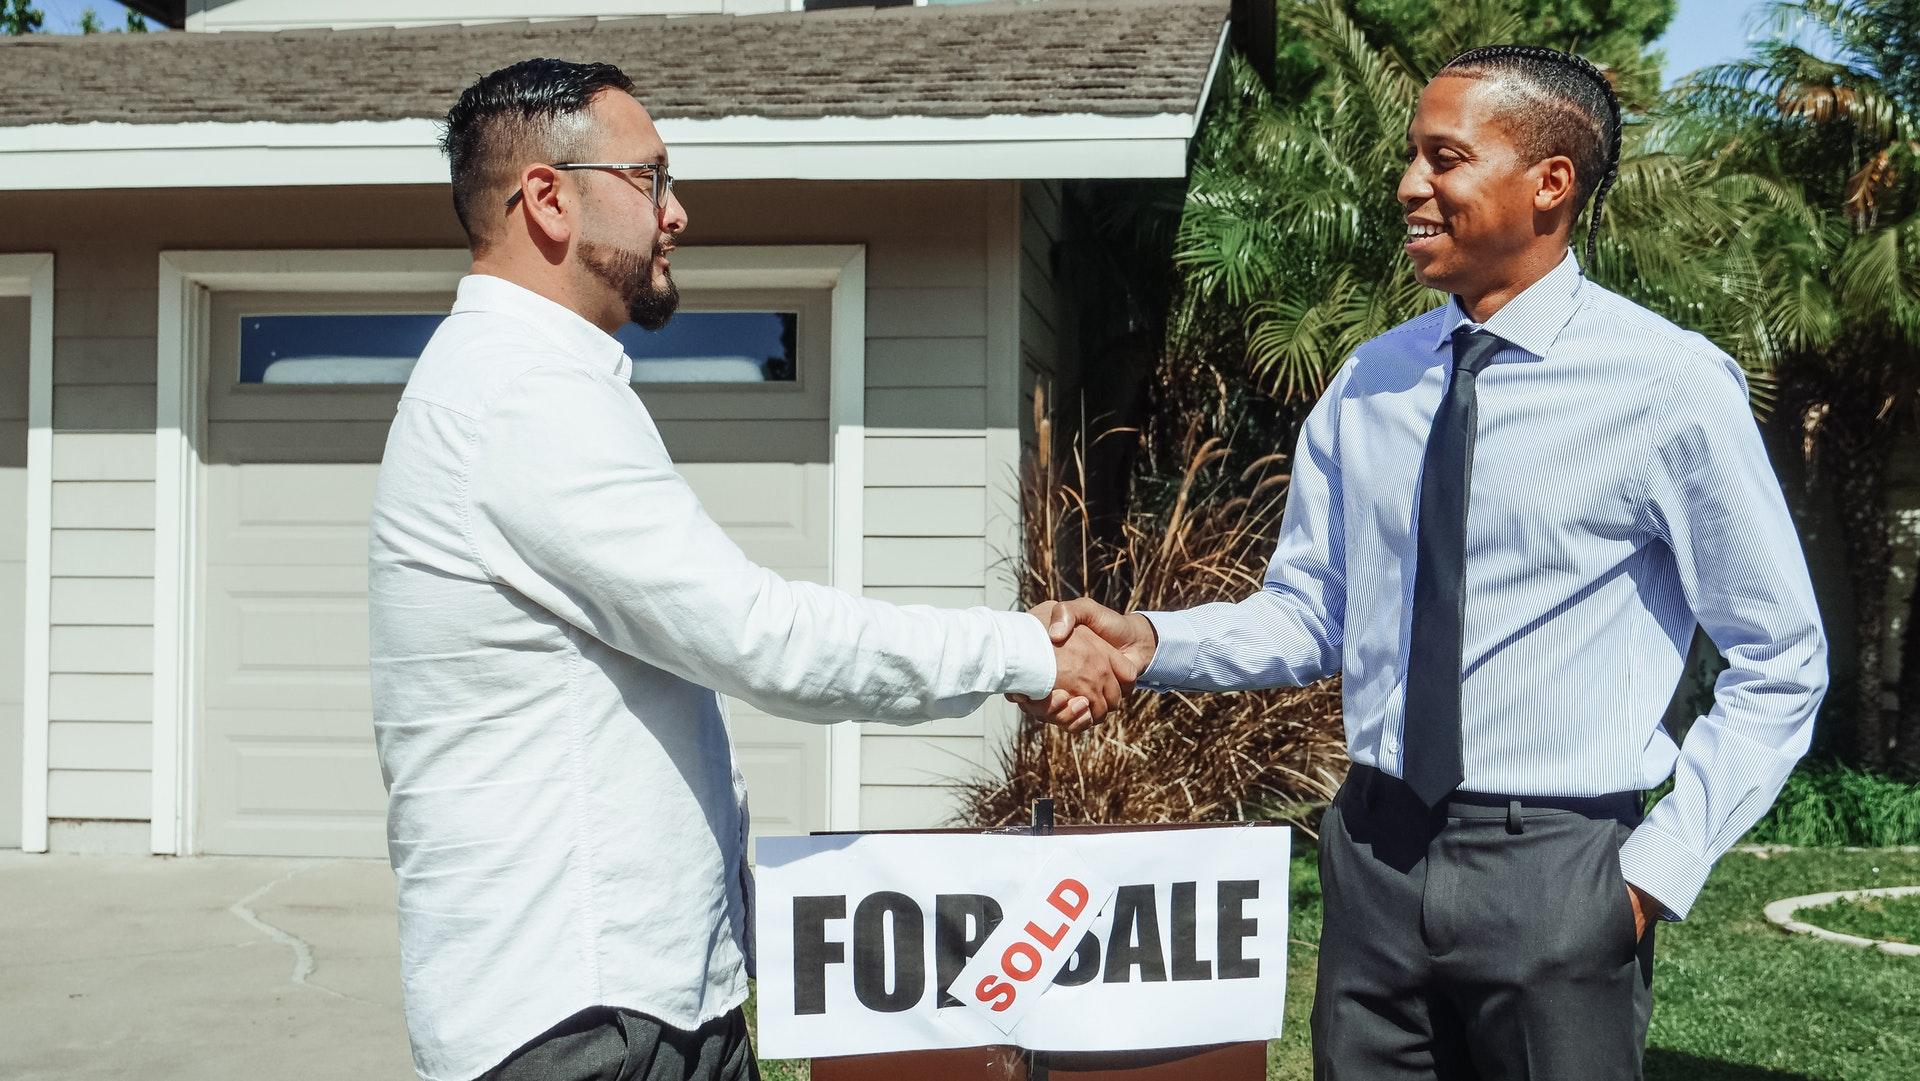 relator and homeowner shaking hands